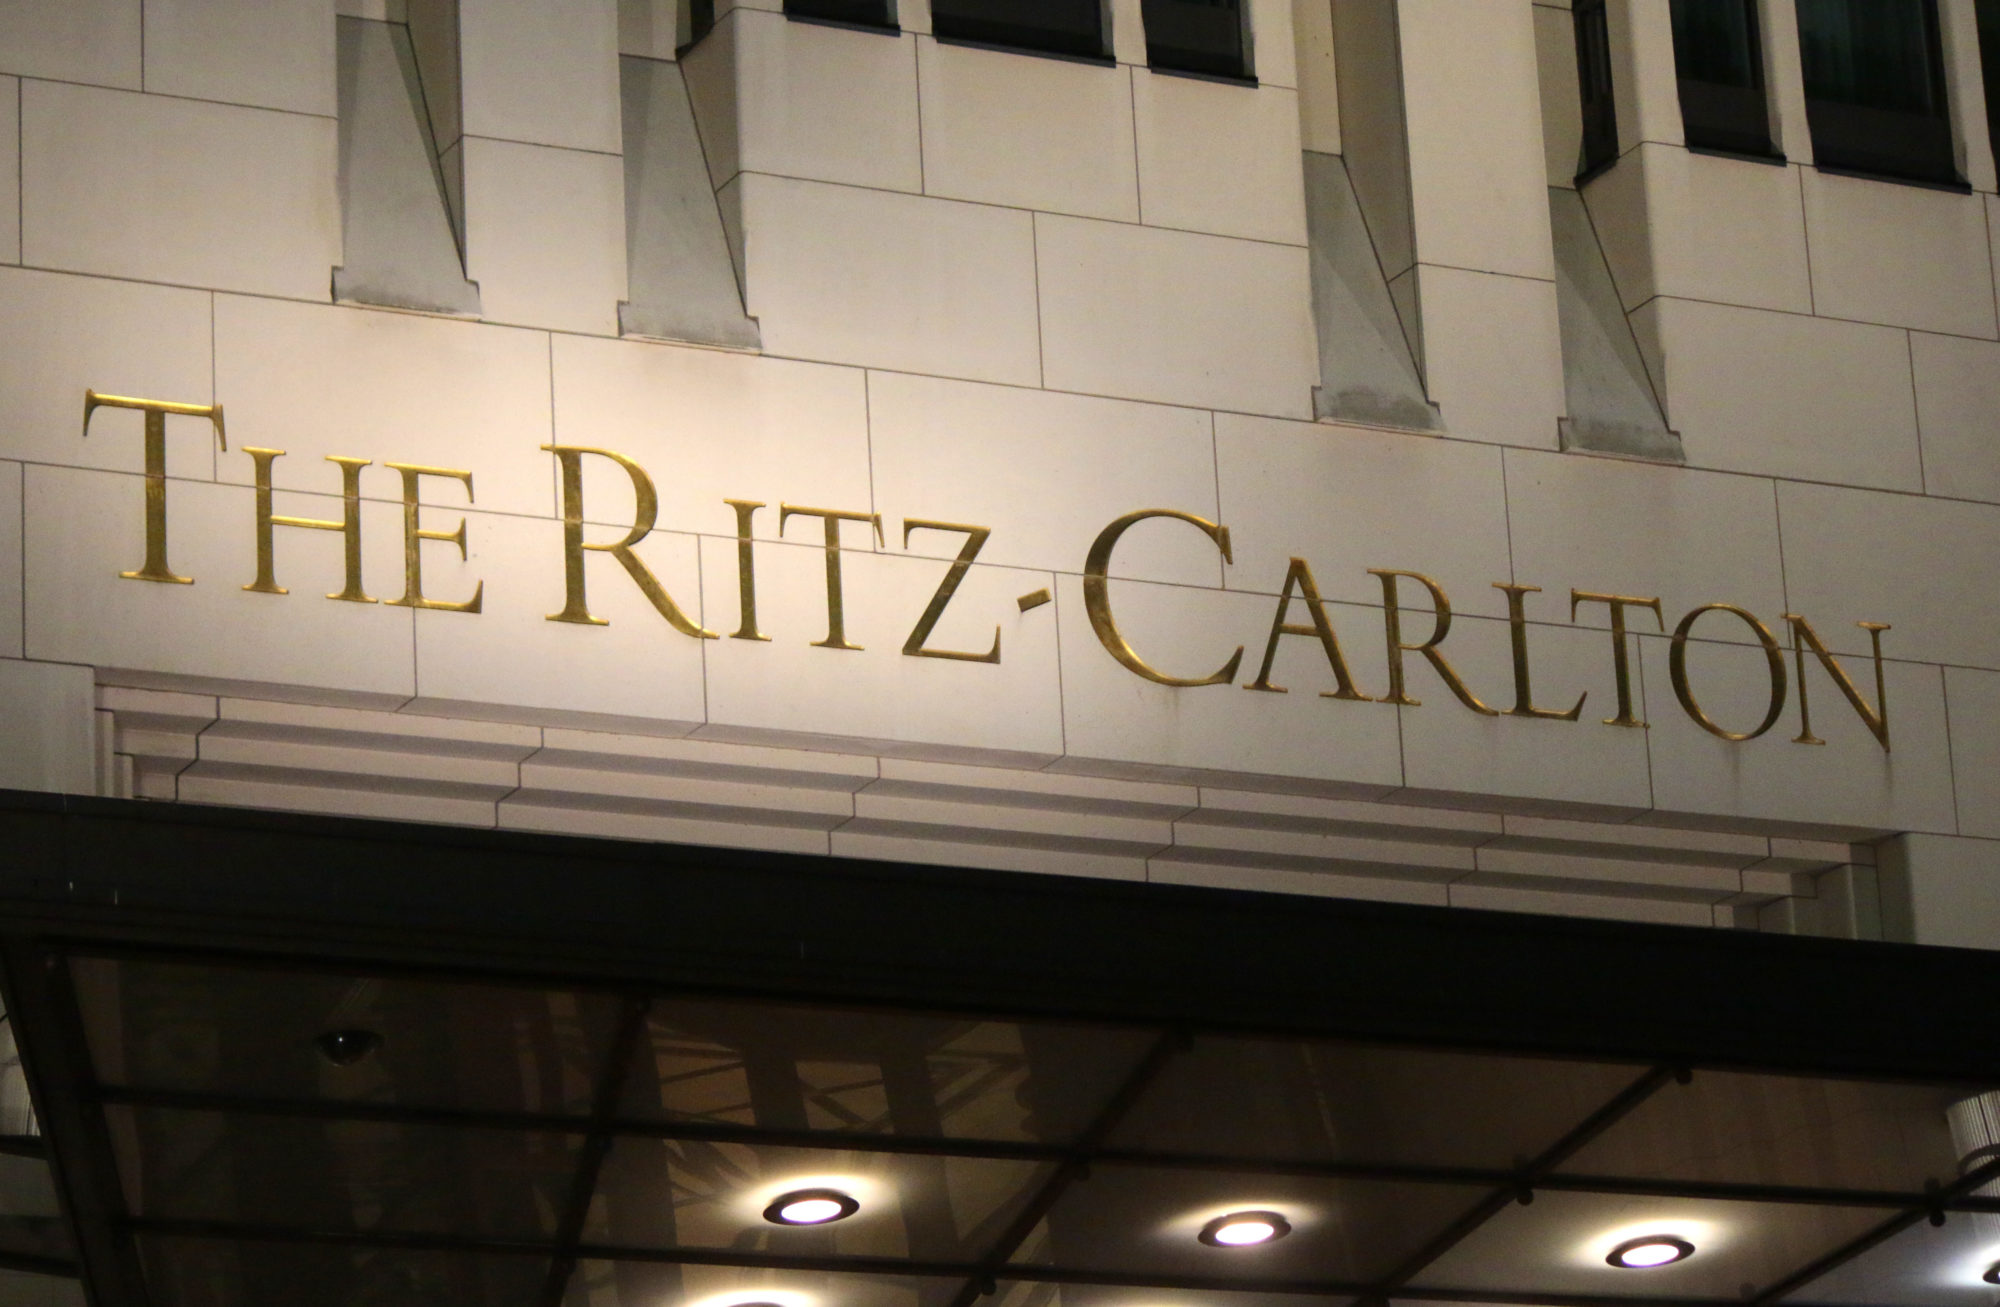 Ritz Carlton Hotel Sign